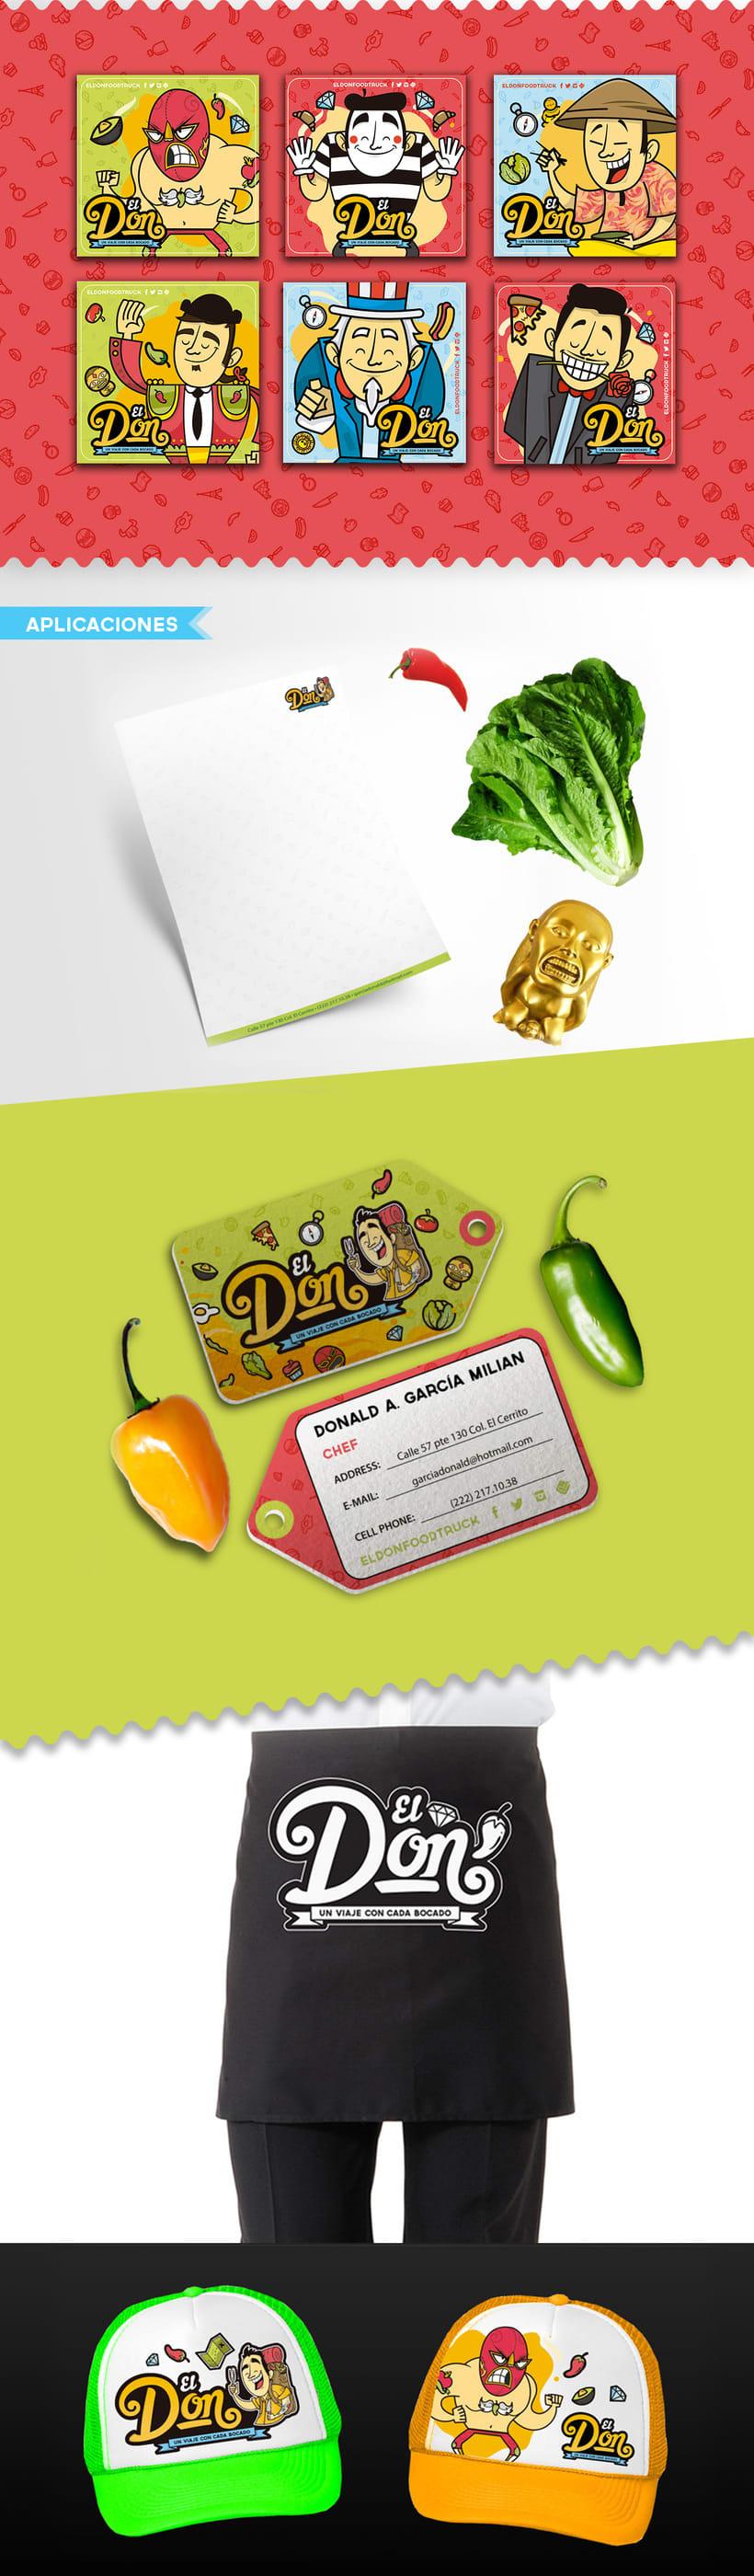 El Don Foodtruck 1